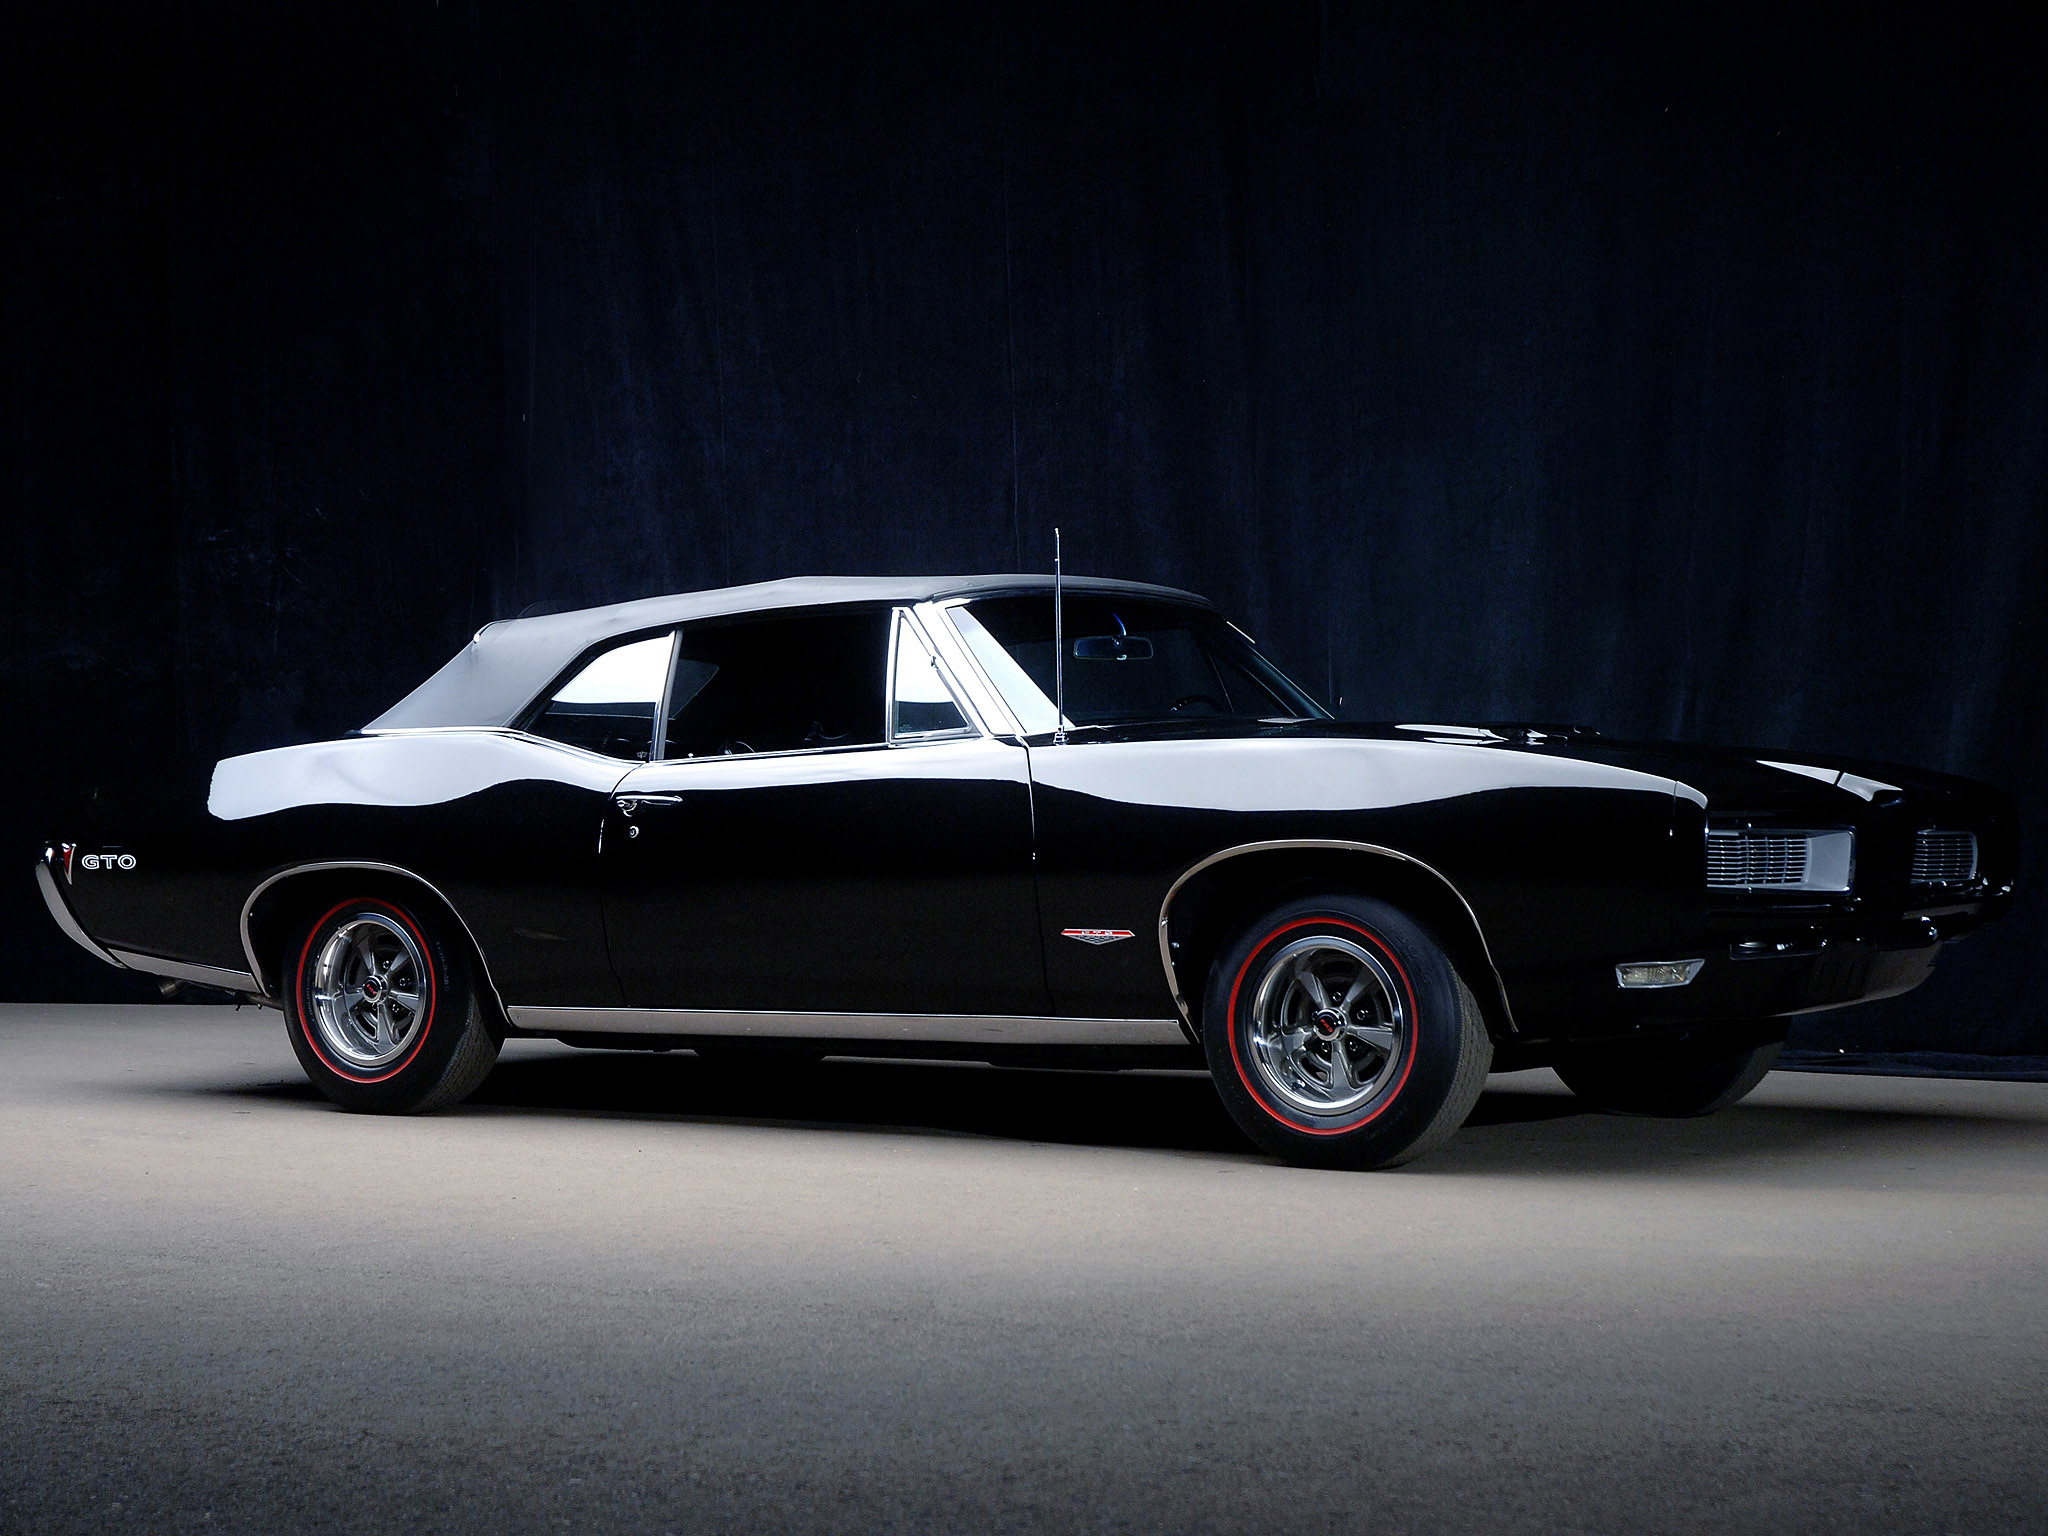 The 1968 Pontiac GTO